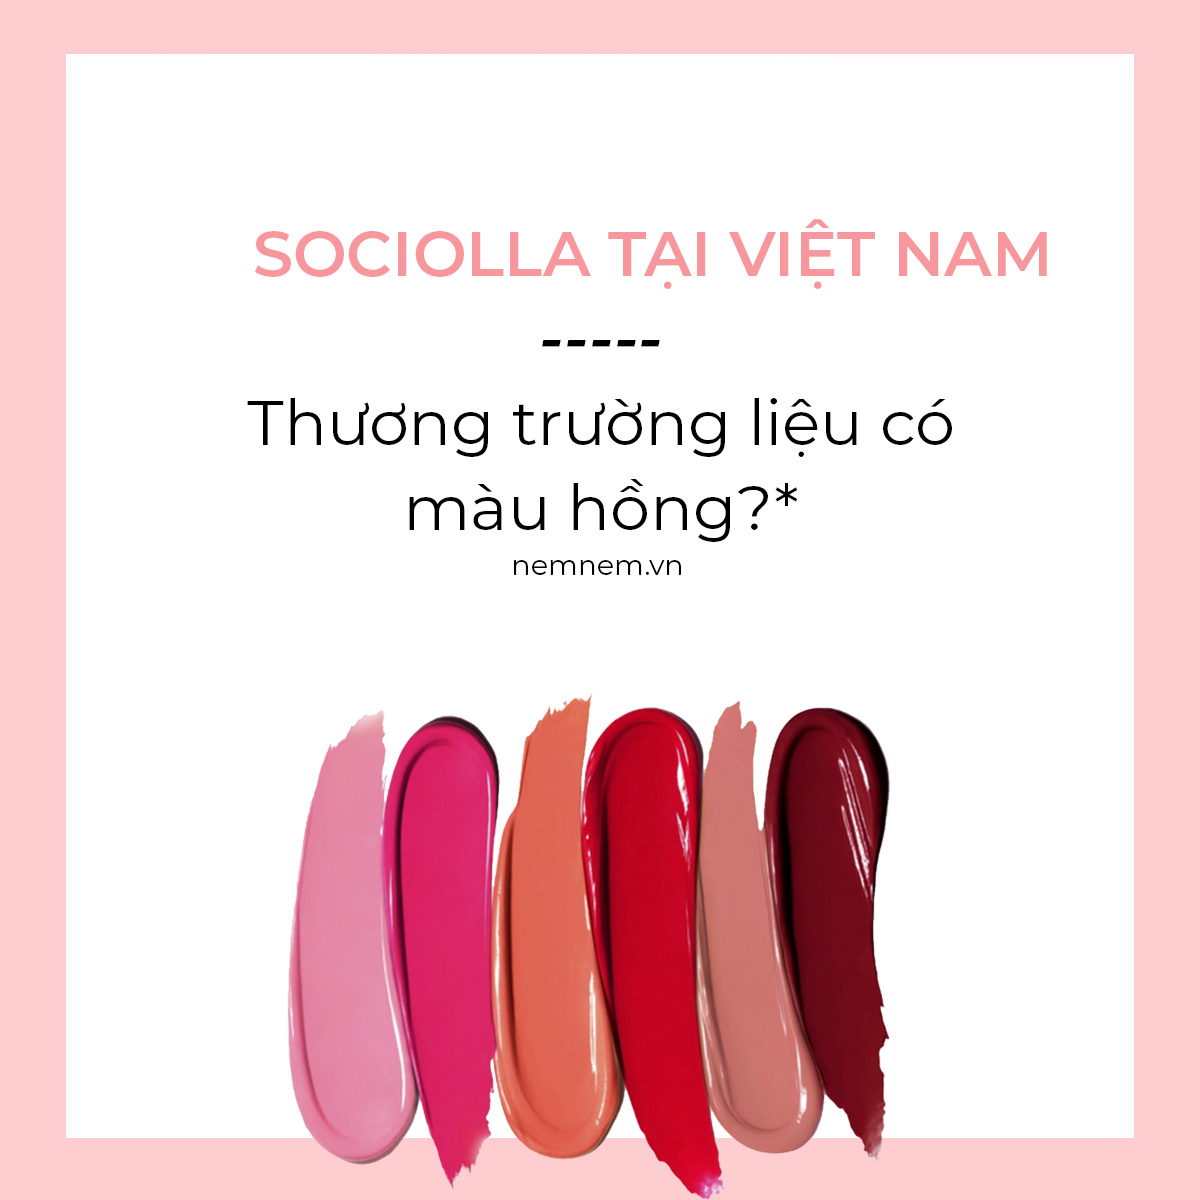 Sociolla Việt nam